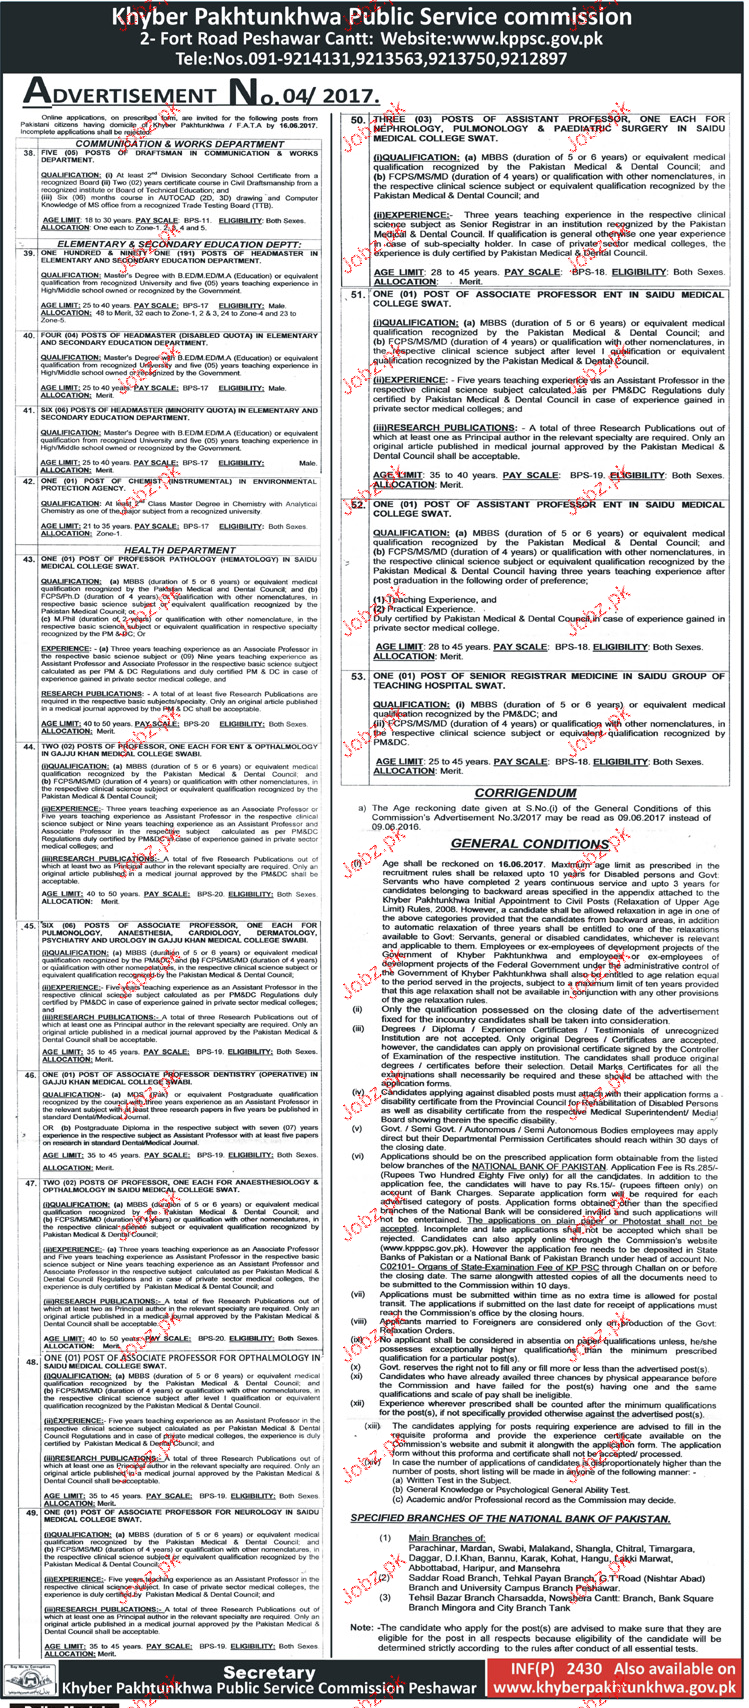 Khyber Pakhtunkhwa Public Service Commission KPSC